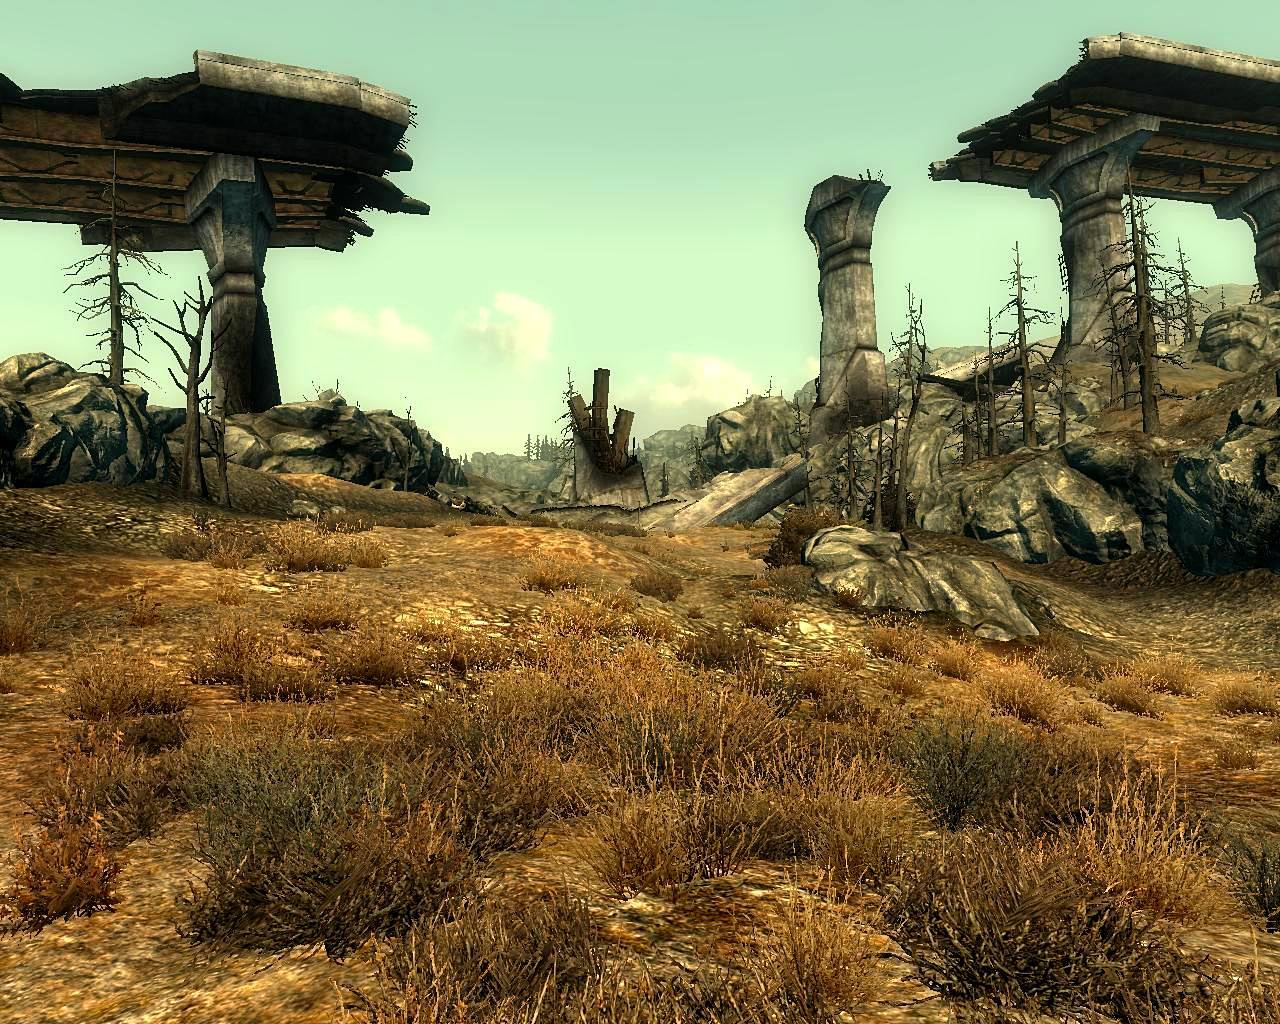 fallout 3 пустошь: http://view-game.ru/kompyuternyie-strelyalki/fallout-3-pustosh-3620.html